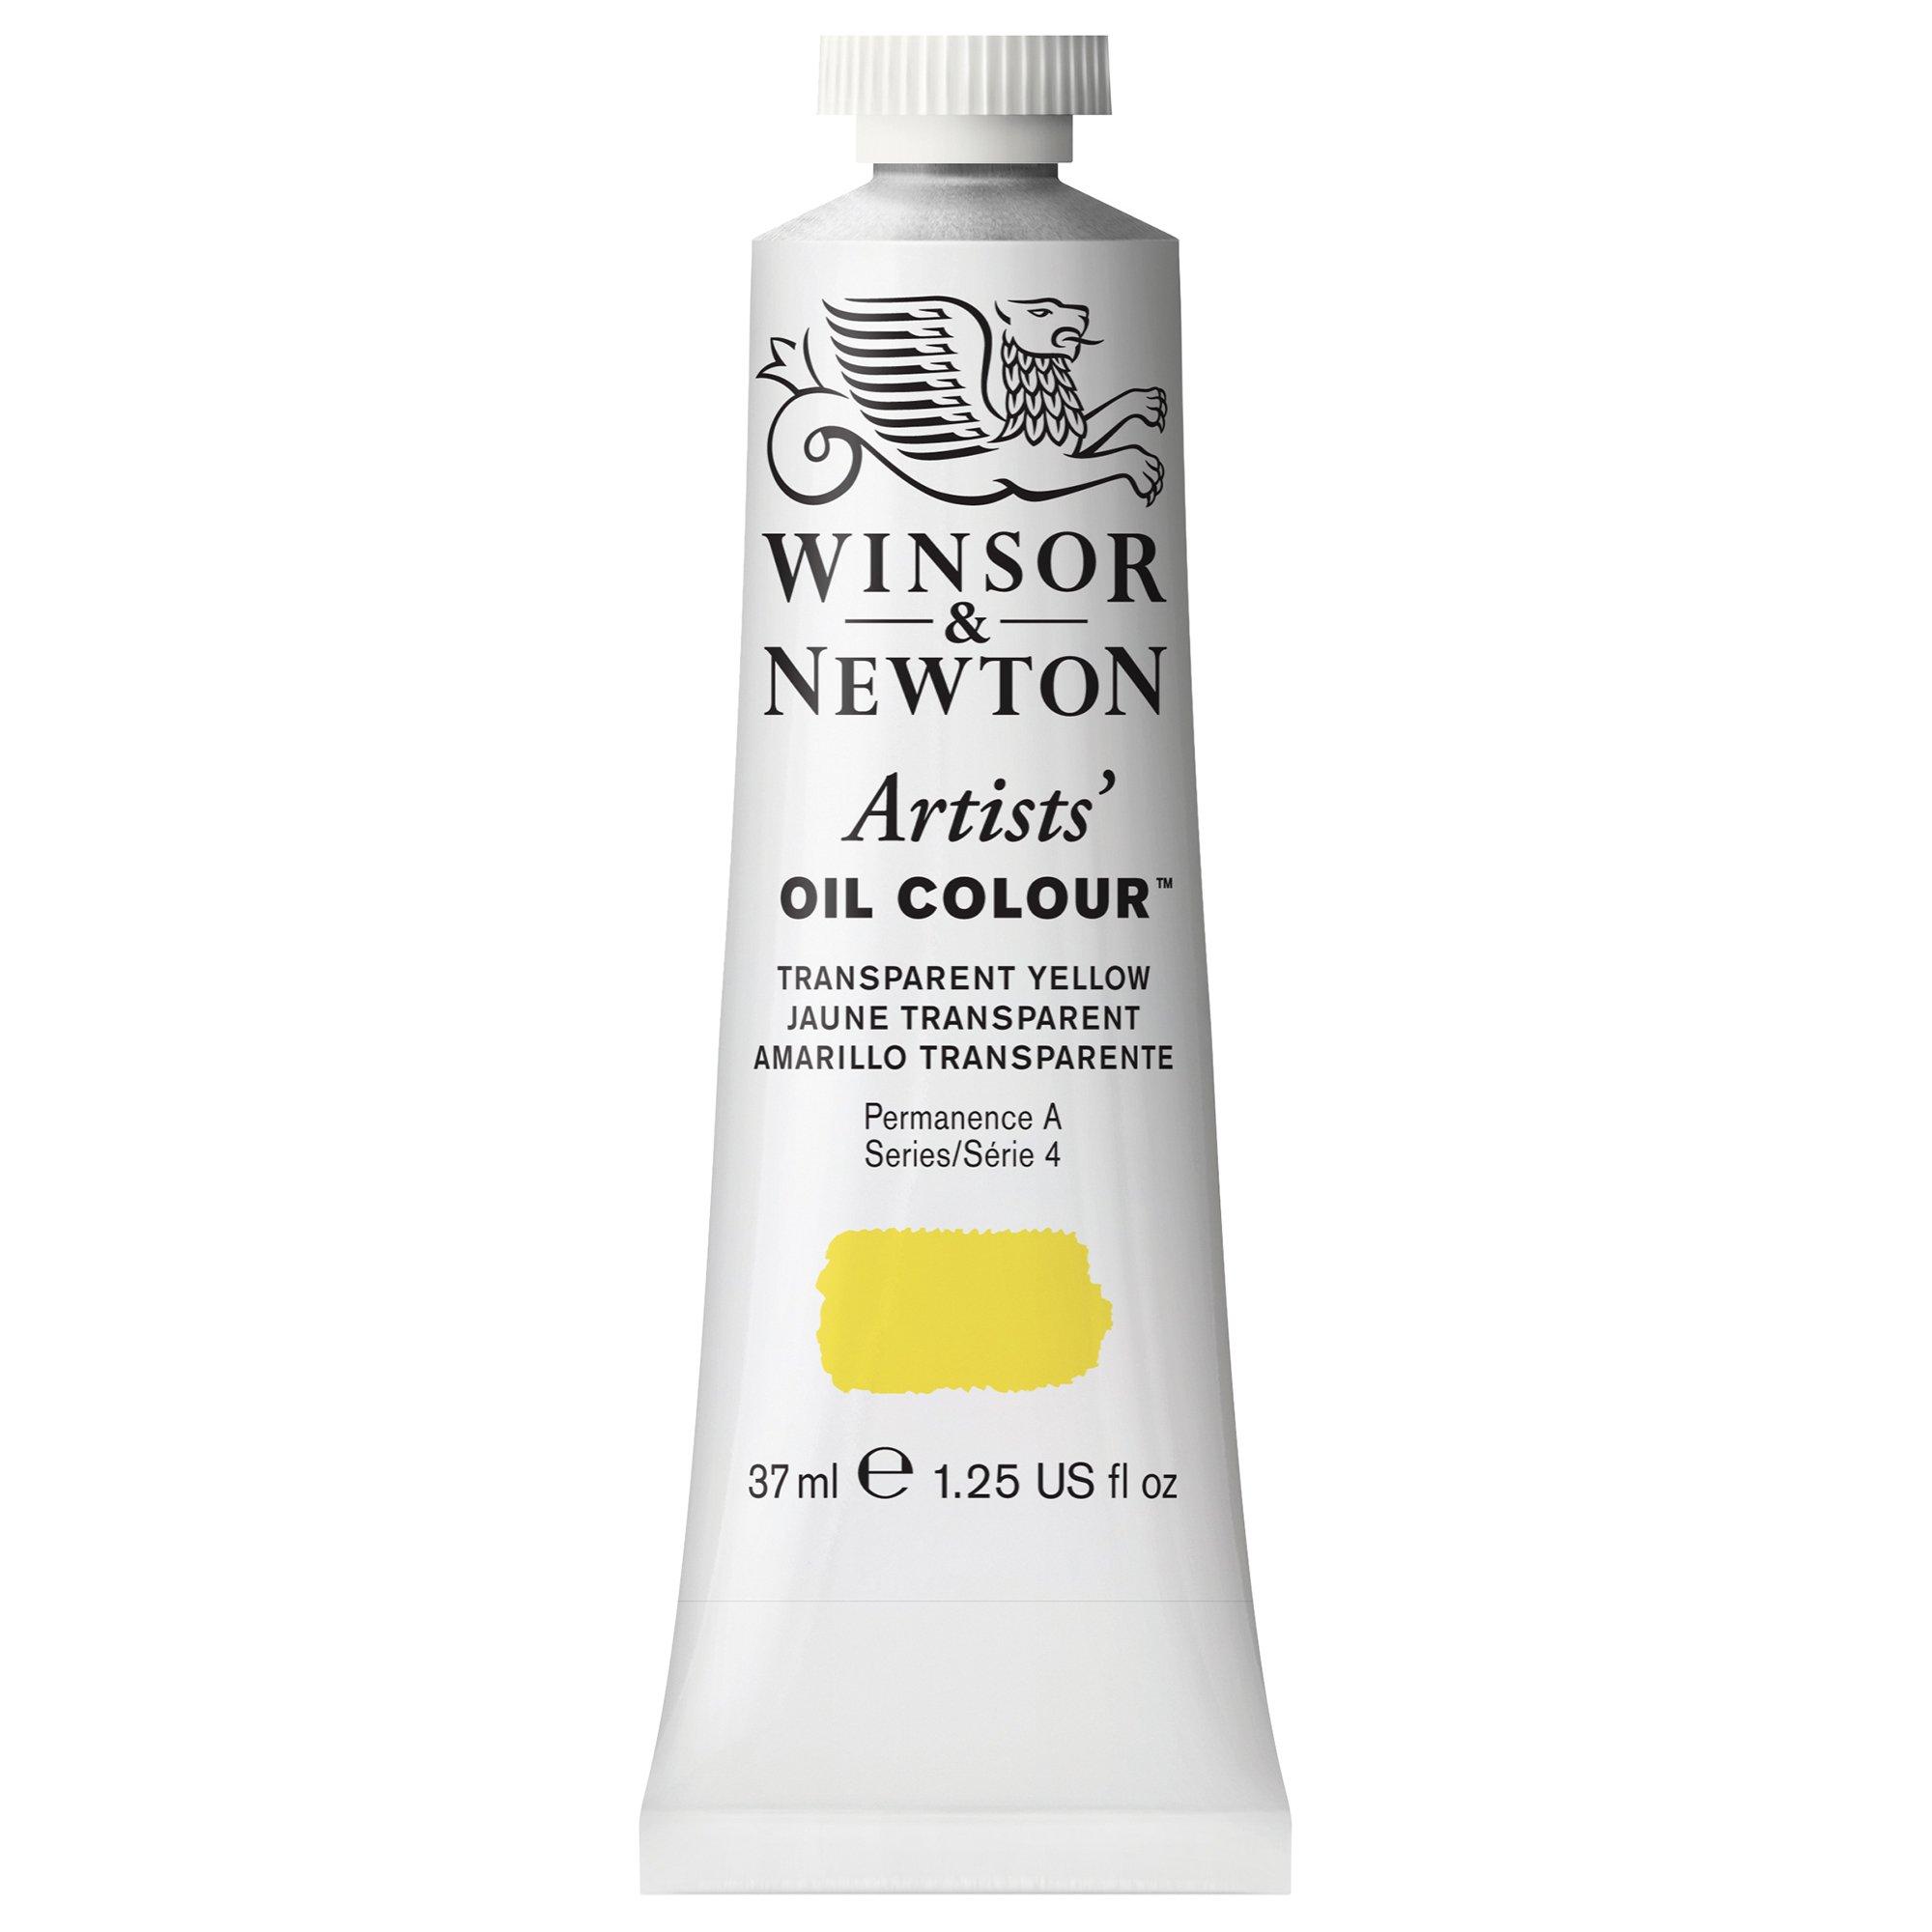 Winsor & Newton Artists' Oil Colour Paint, 37ml Tube, Transparent Yellow